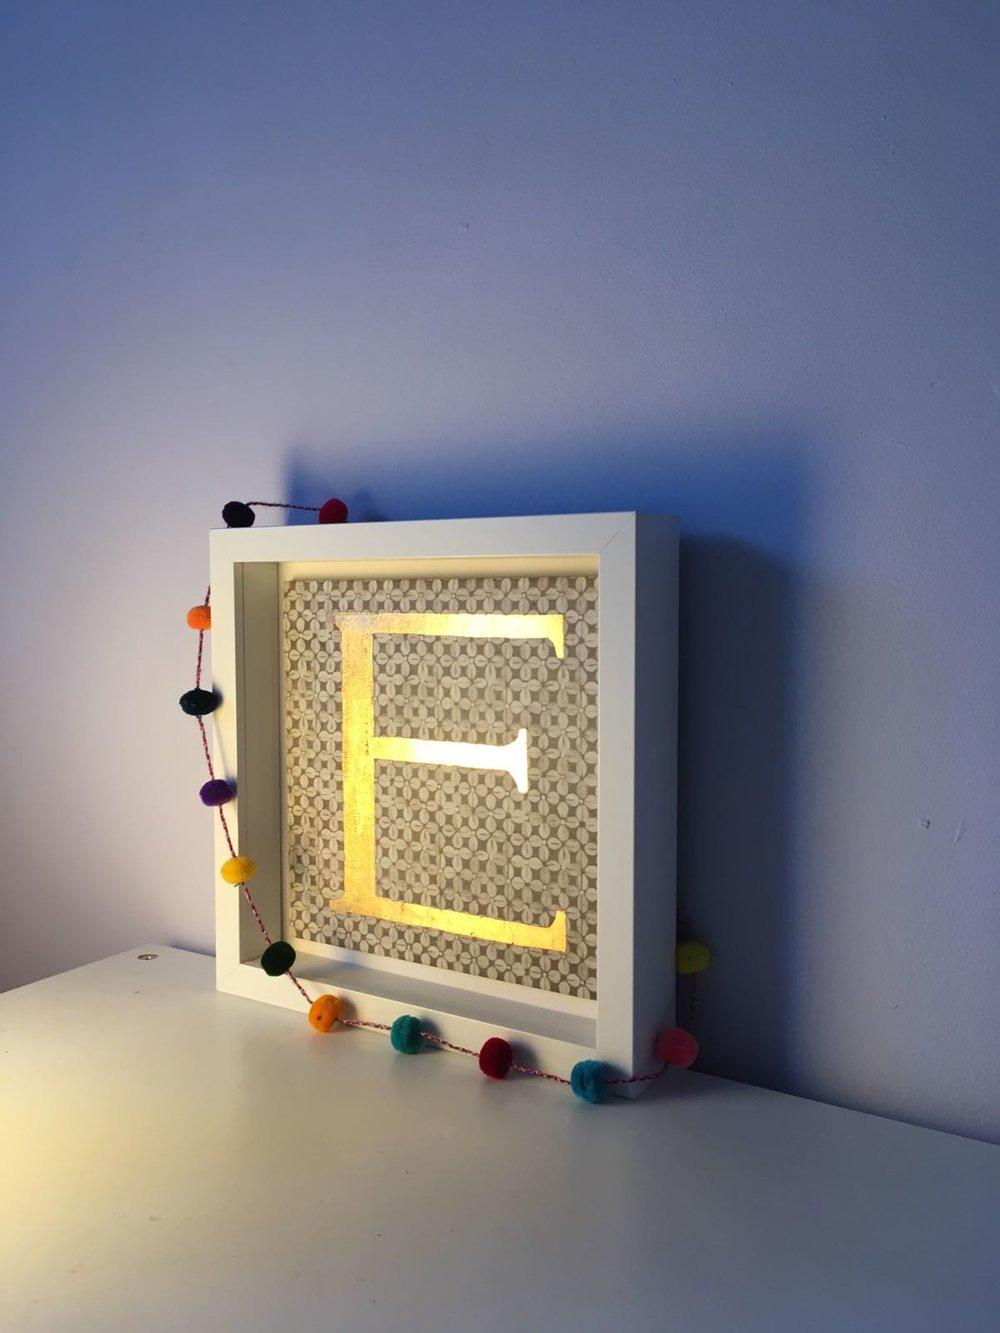 Alphabet Tile - We created this 'E' tile for a little Edward's room.